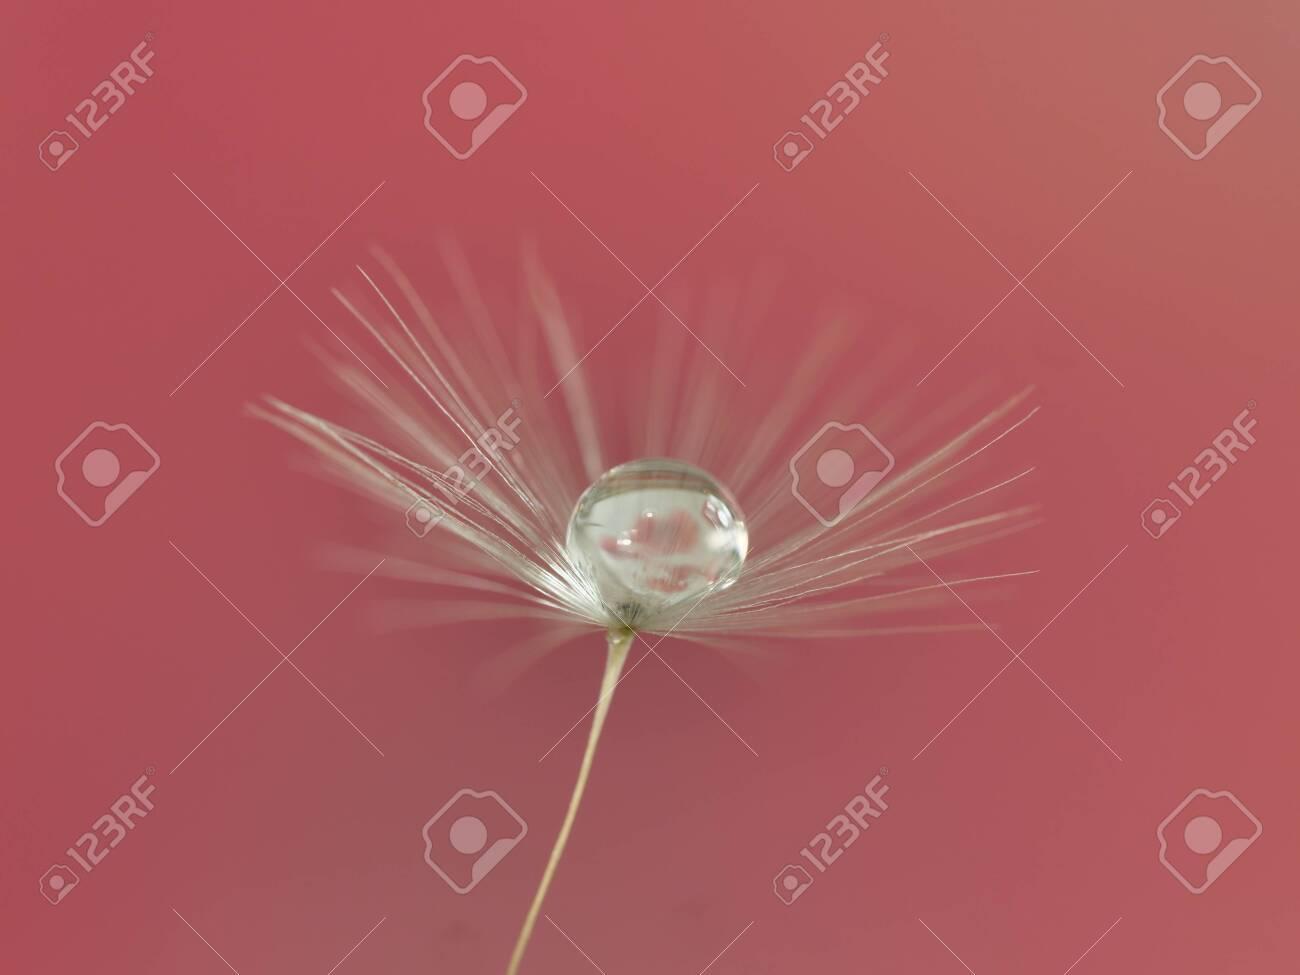 dandelion seed with water droplets macro - 146682448